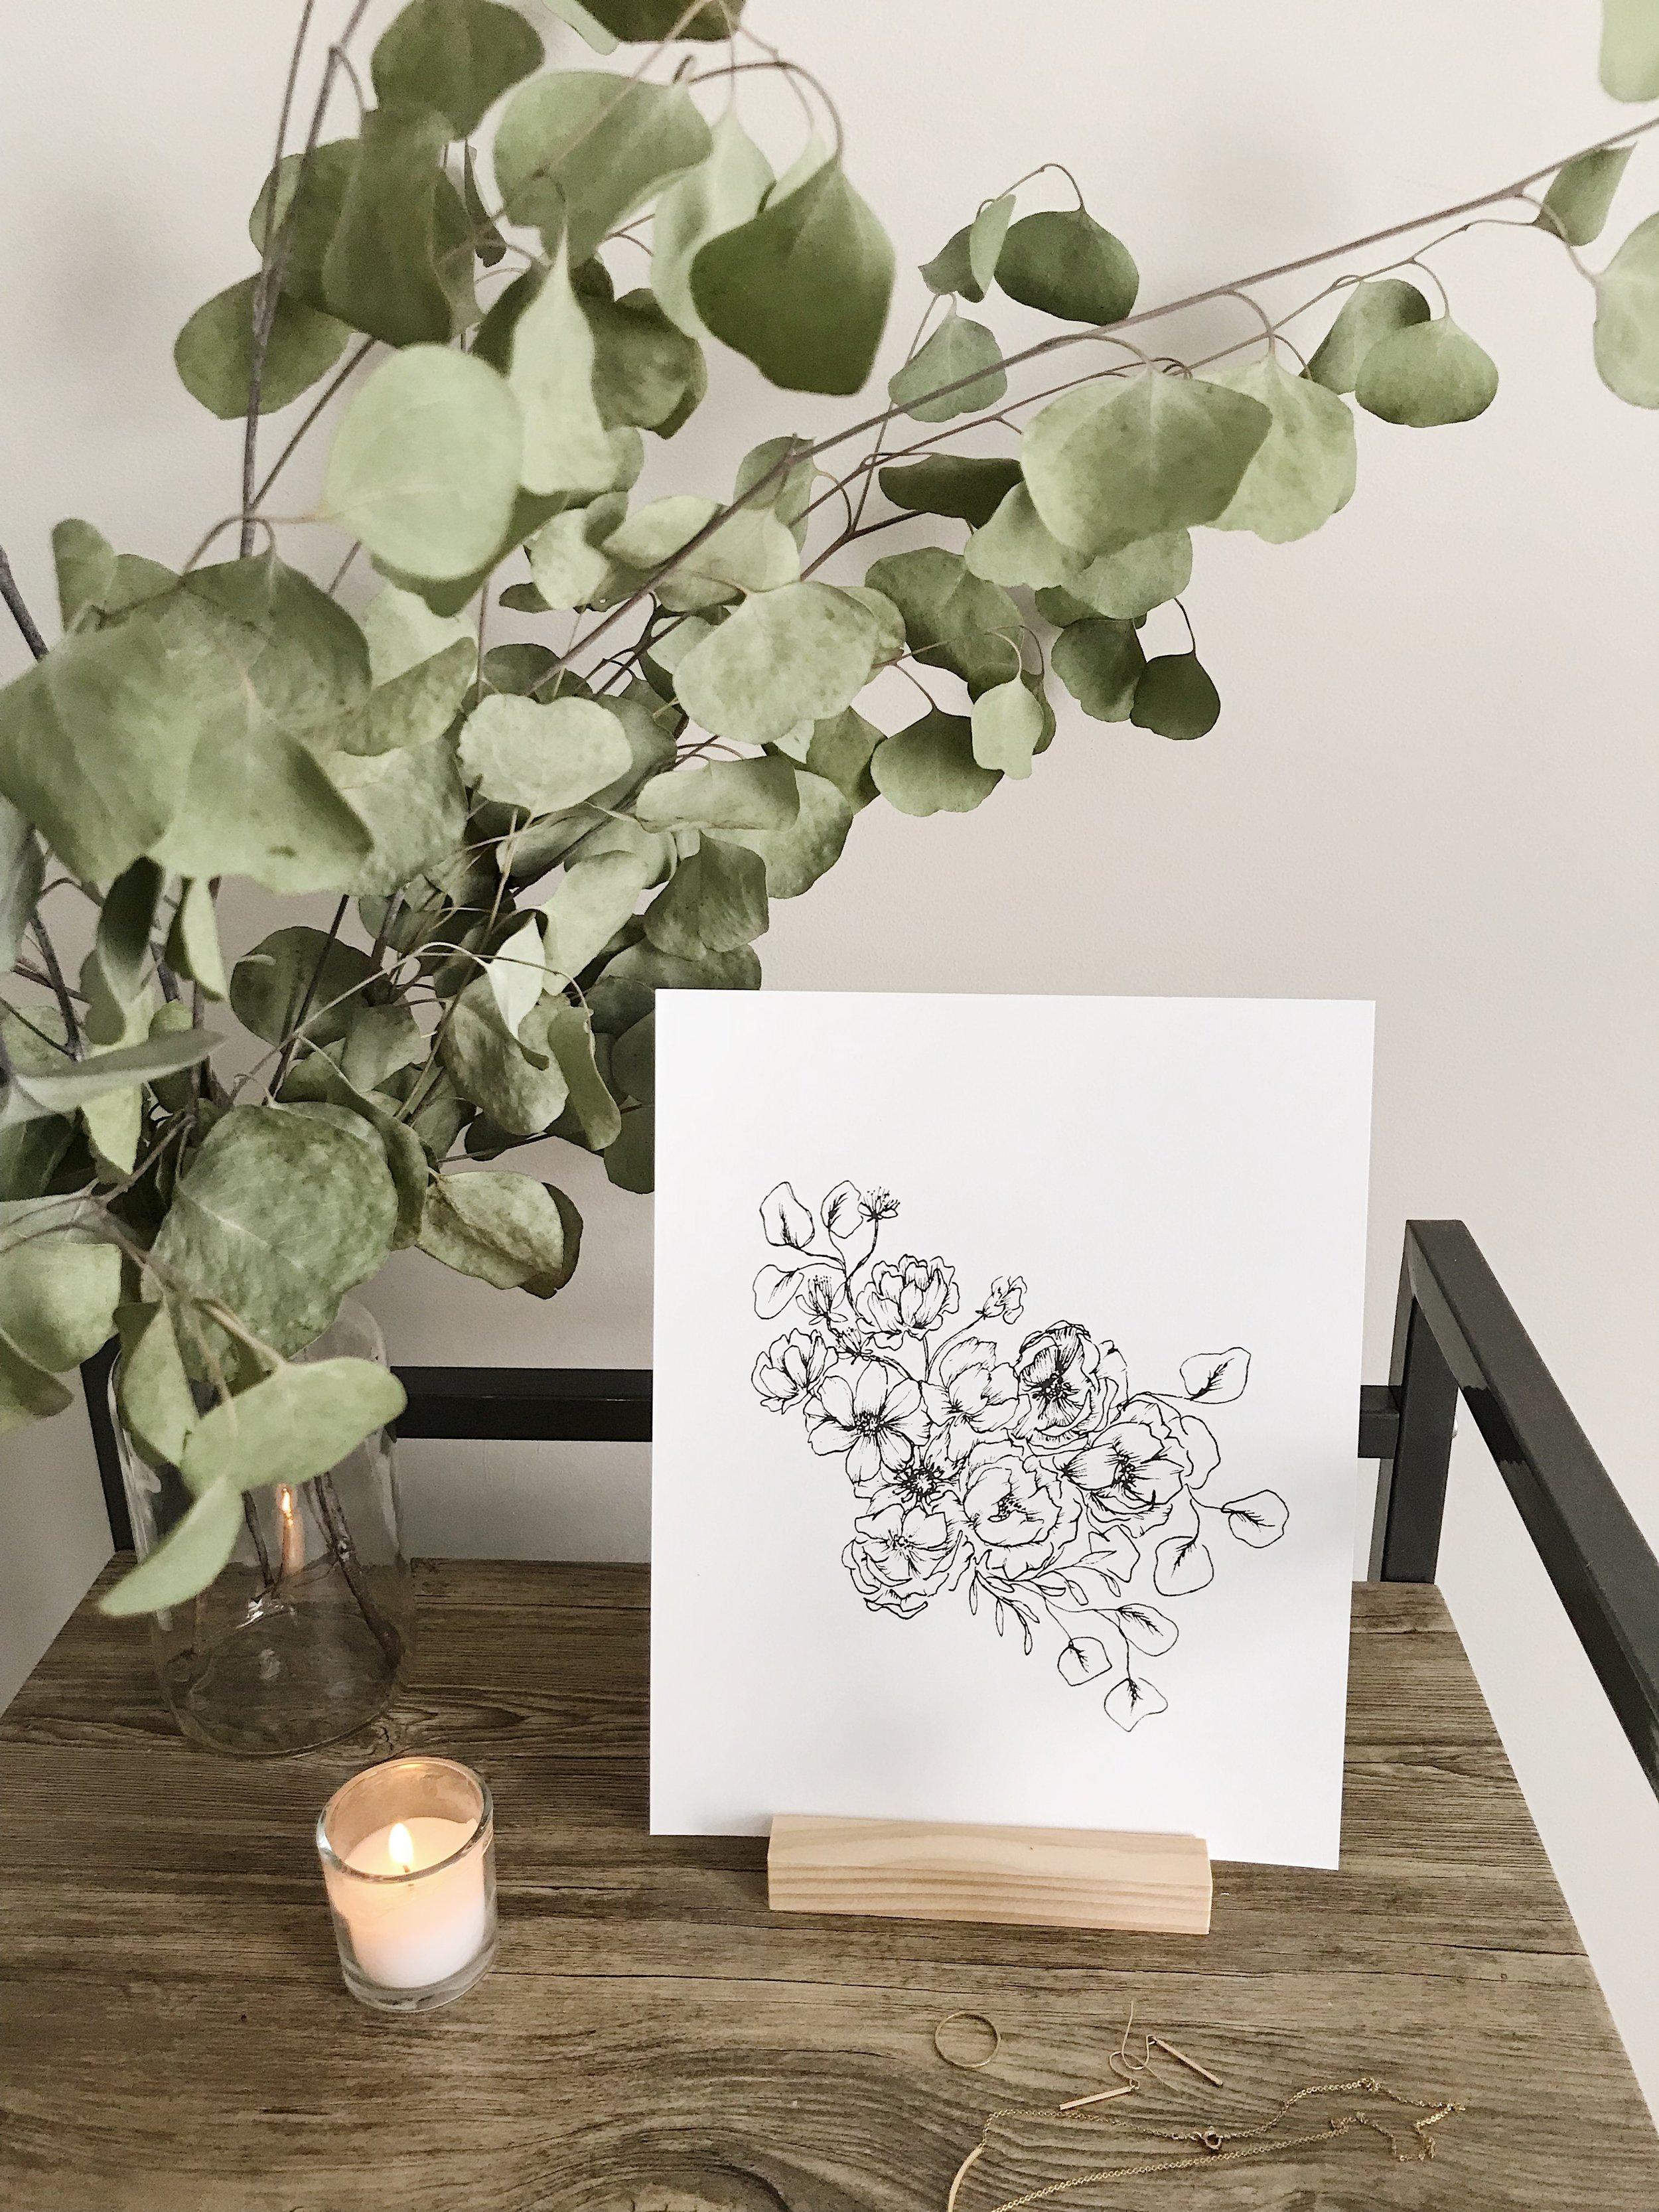 FloralIllustration001_AnIntroduction_astrantia_garden rose_eucalyptus_carnation_cosmos_anemone_01